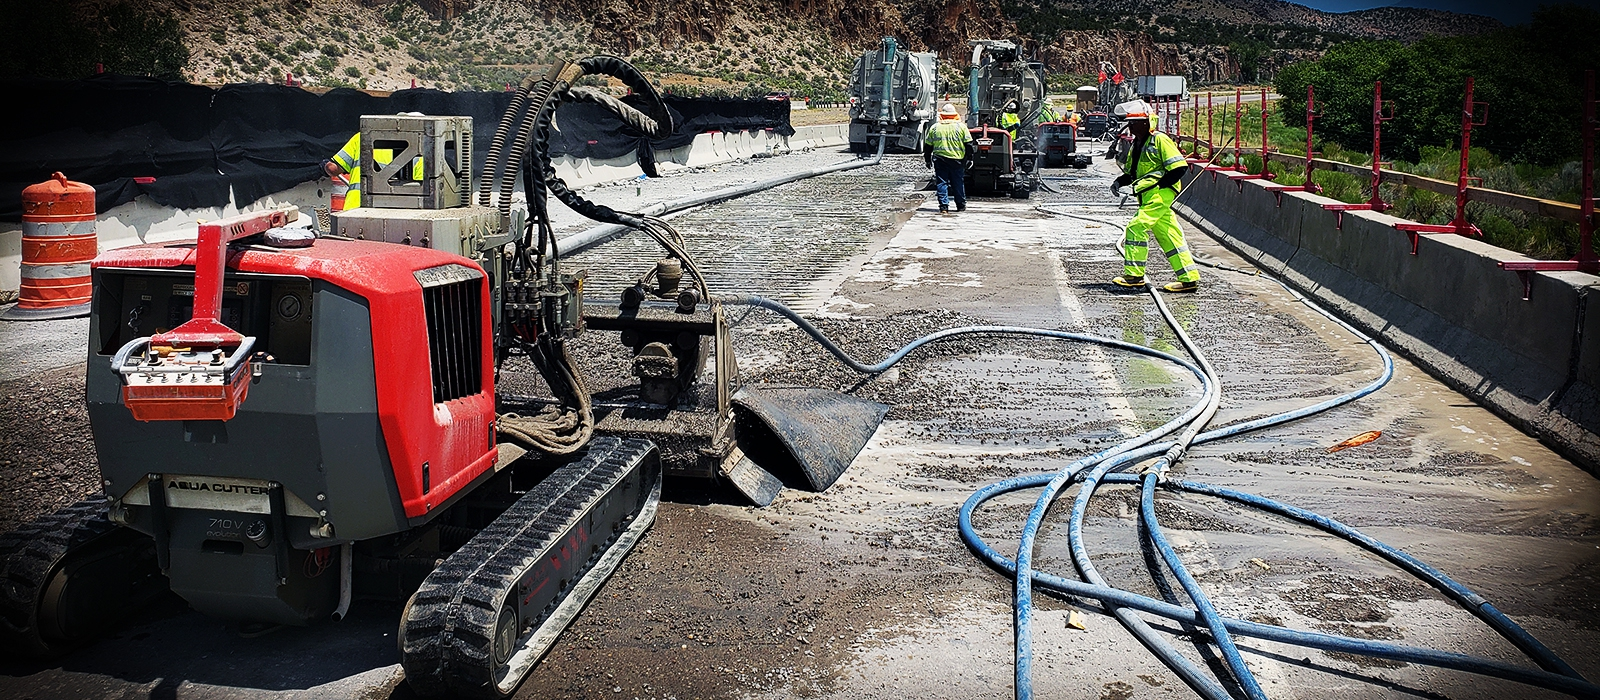 hydrodemolition aquajet systems aqua cutter work place renovation road